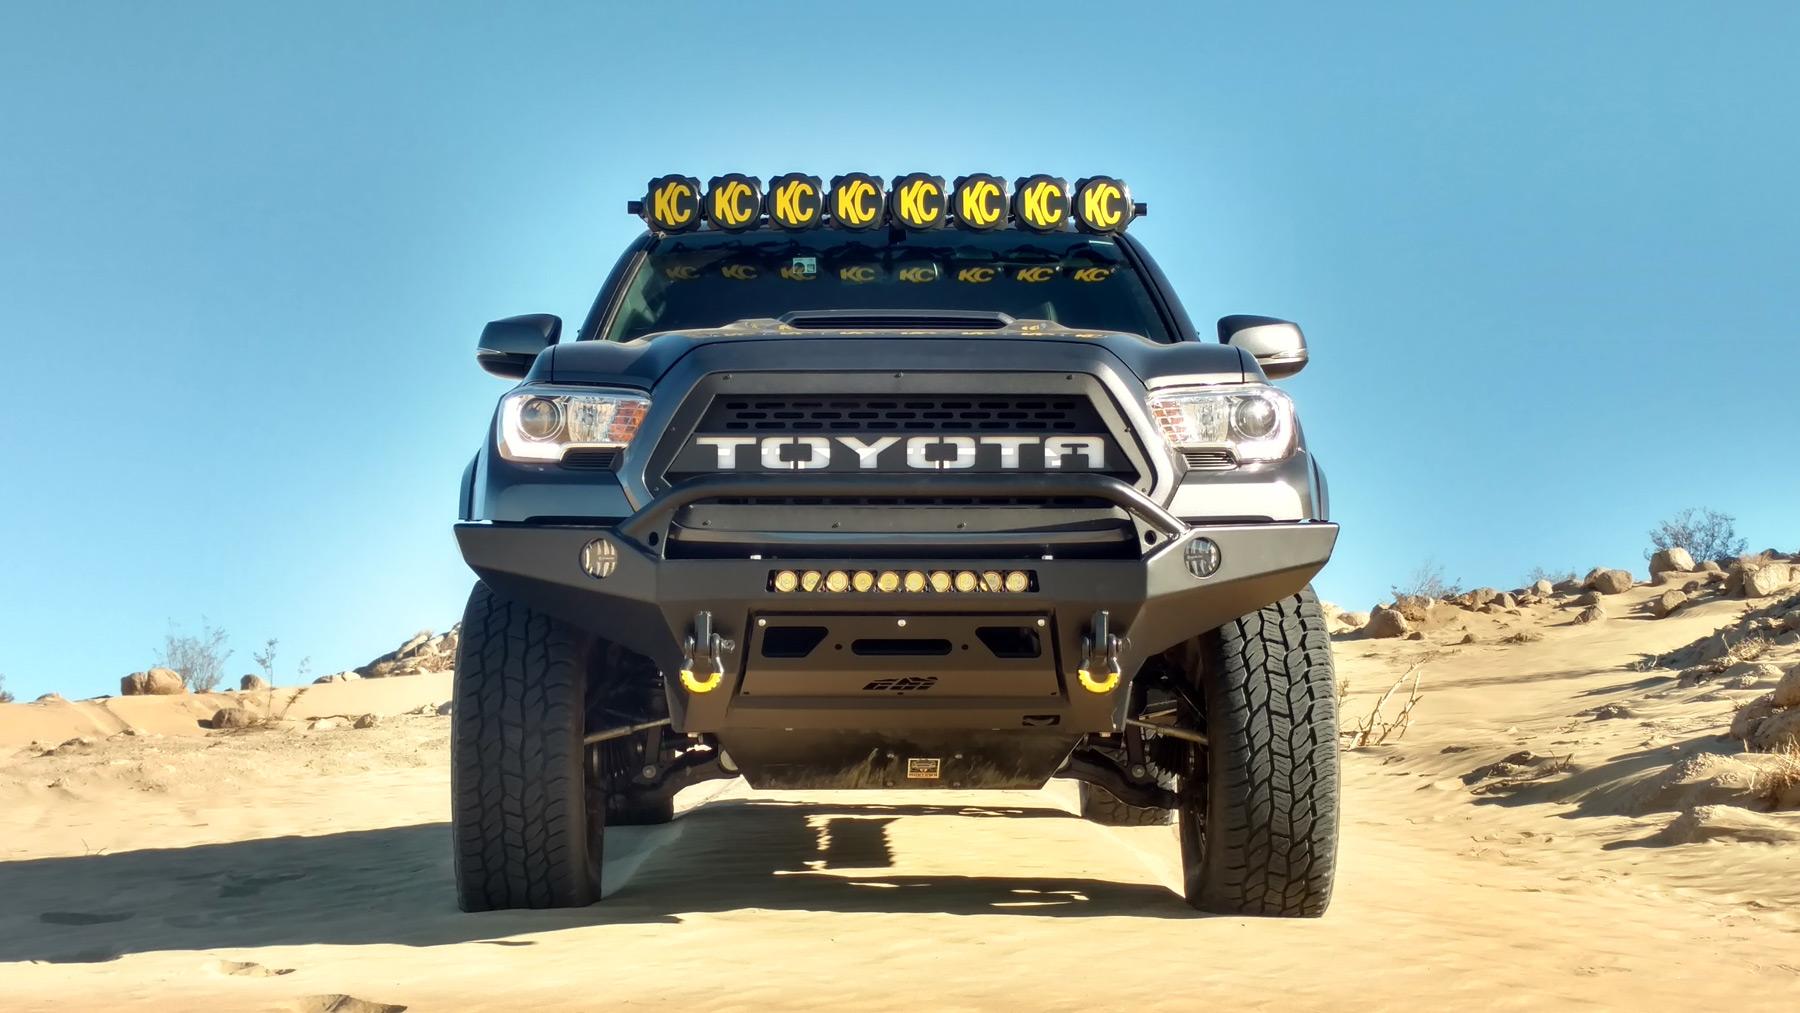 Custom Off Road Desert Stormer Toyota Tacoma - Image #01